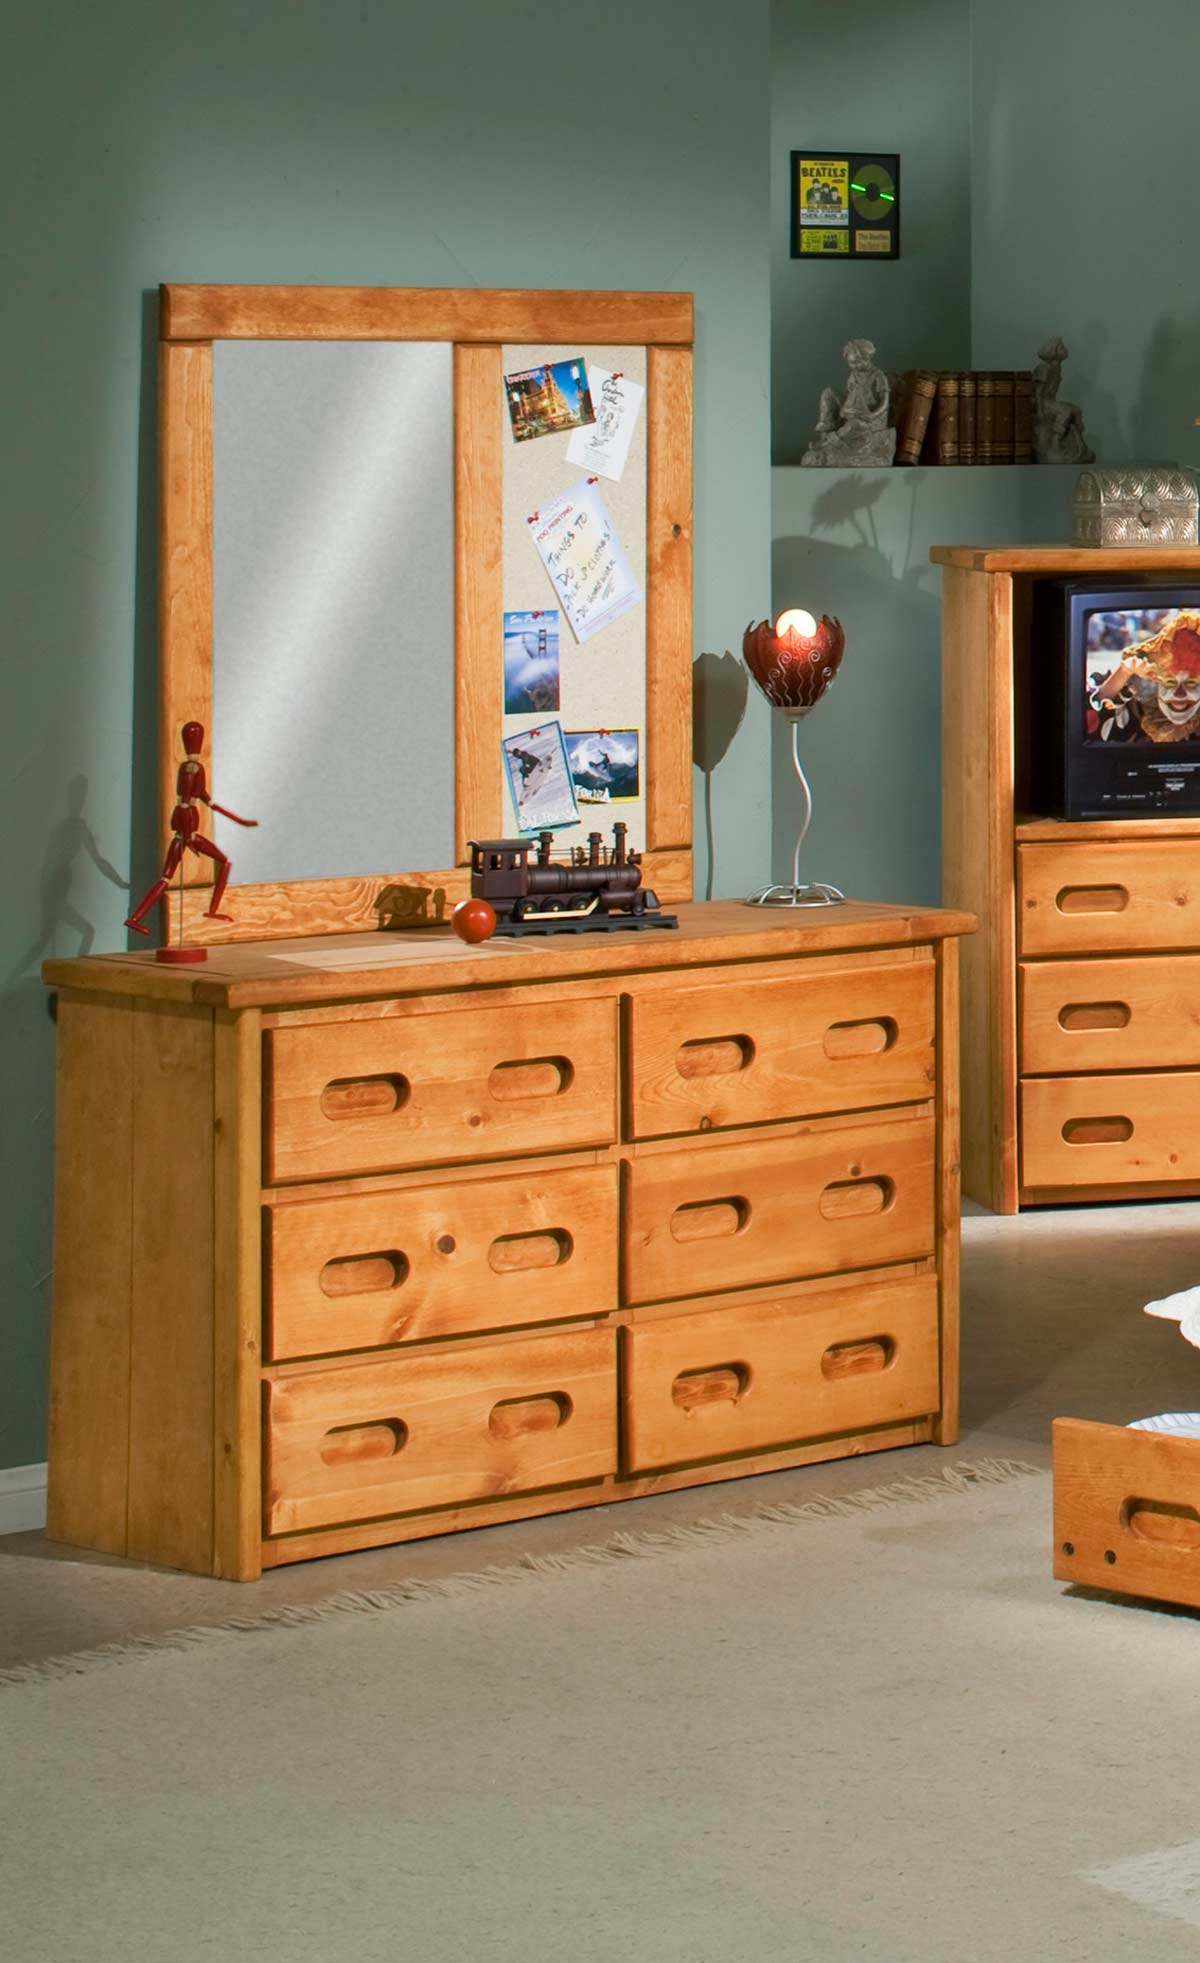 Chelsea Home 3544775-4780 6 Drawer Dresser with Mirror - Cinnamon